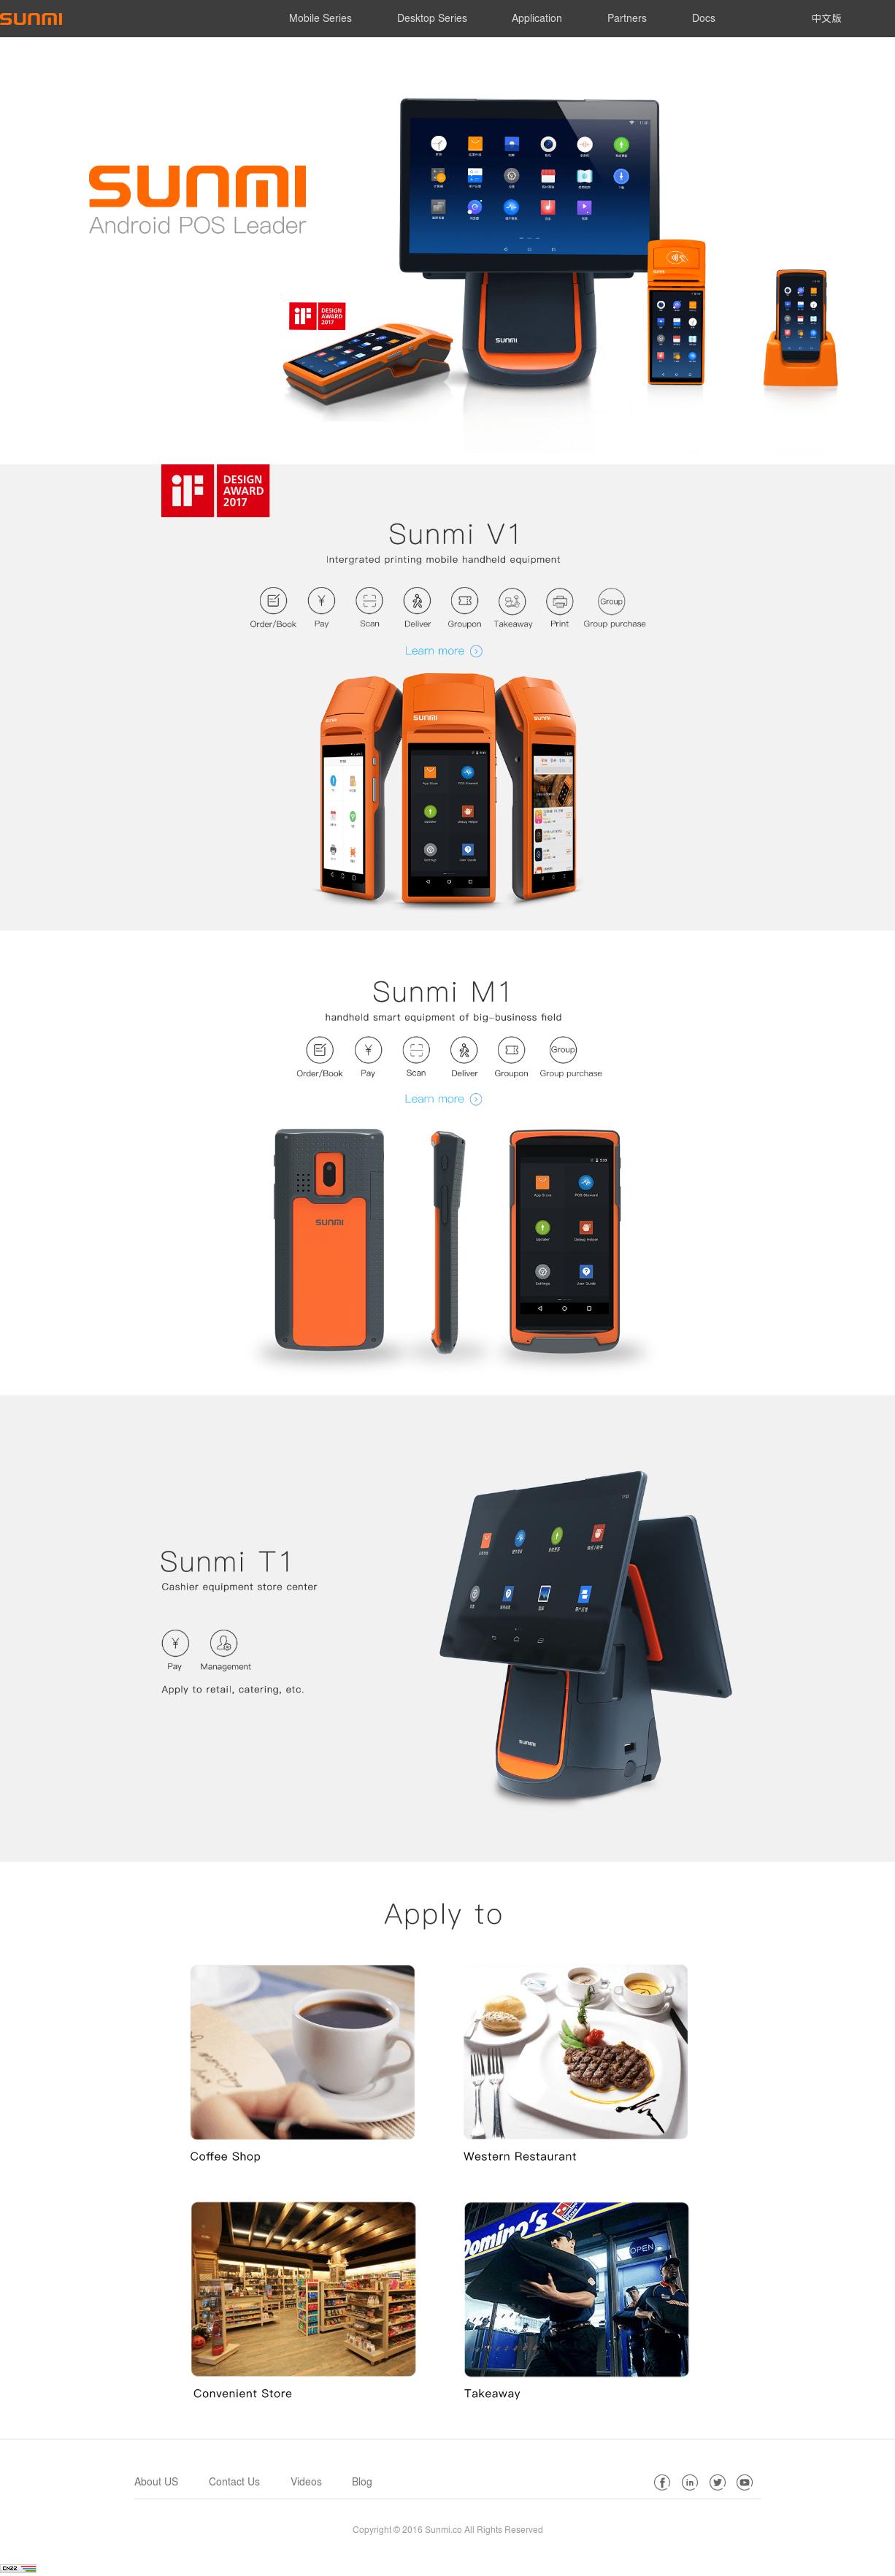 SUNMI Competitors, Revenue and Employees - Owler Company Profile